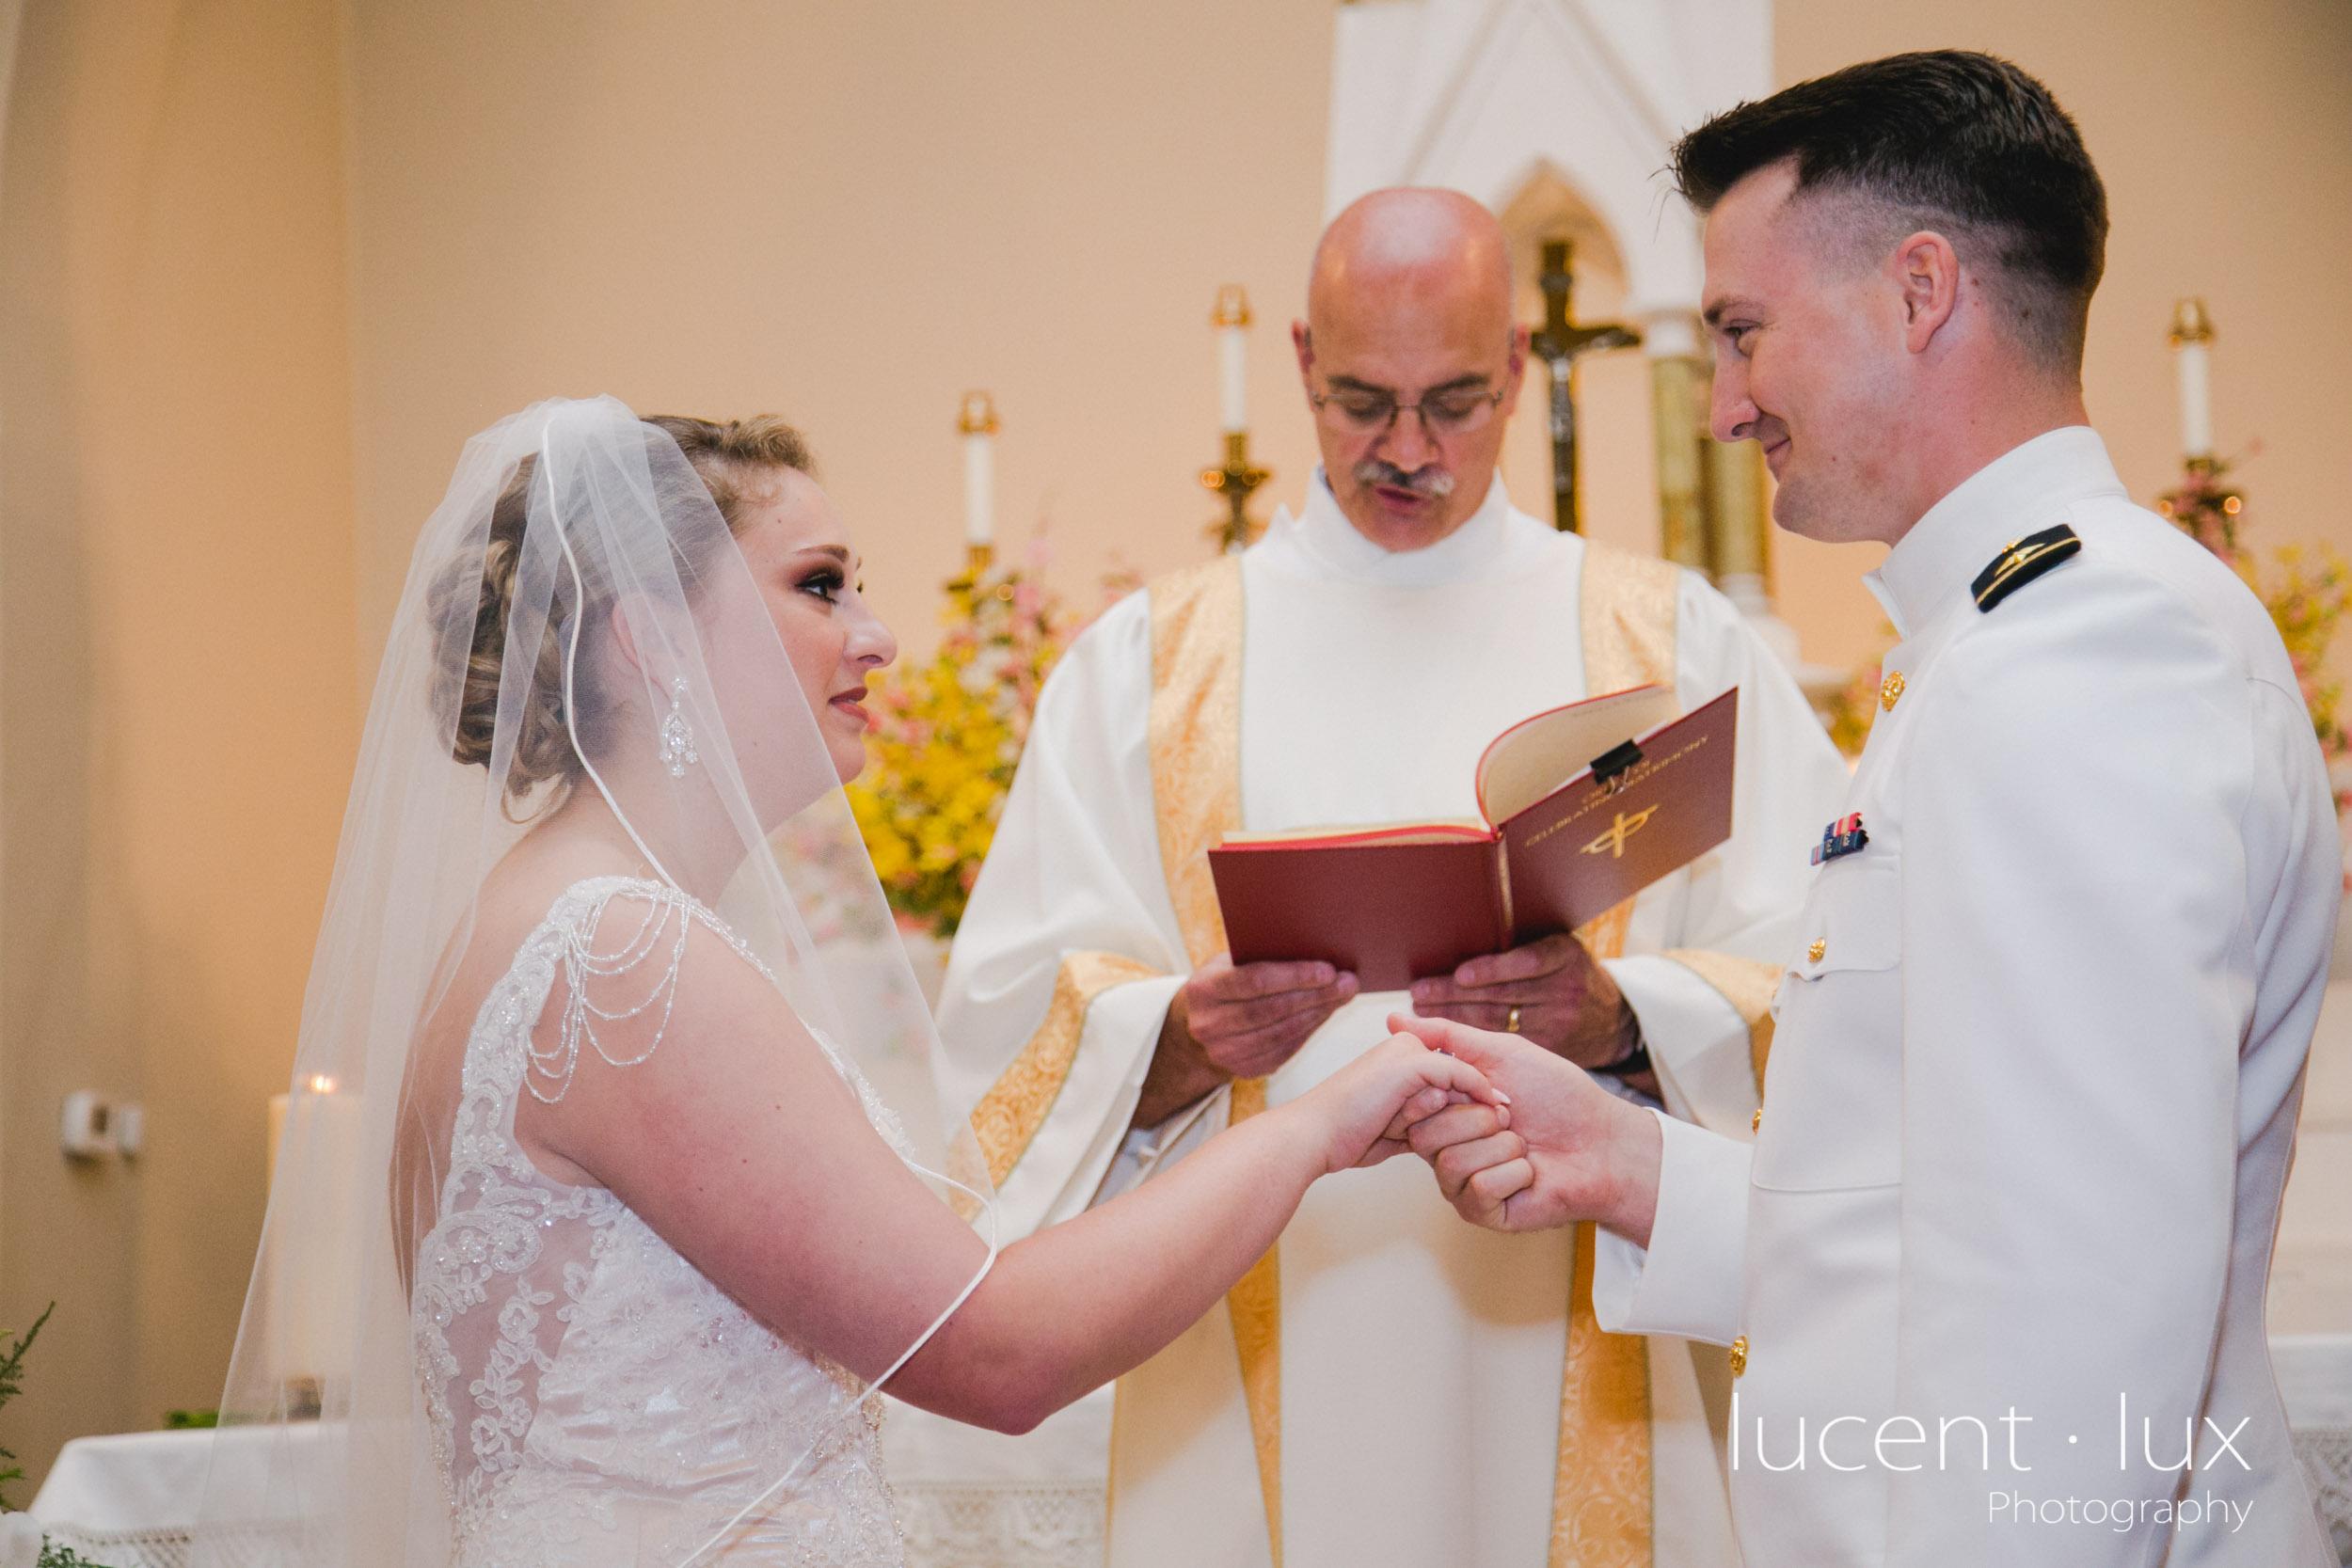 Wedding-Photography-Maryland-Pennsylvania-Photographer-Mendenhall-Inn-Media-Portrait-Event-121.jpg